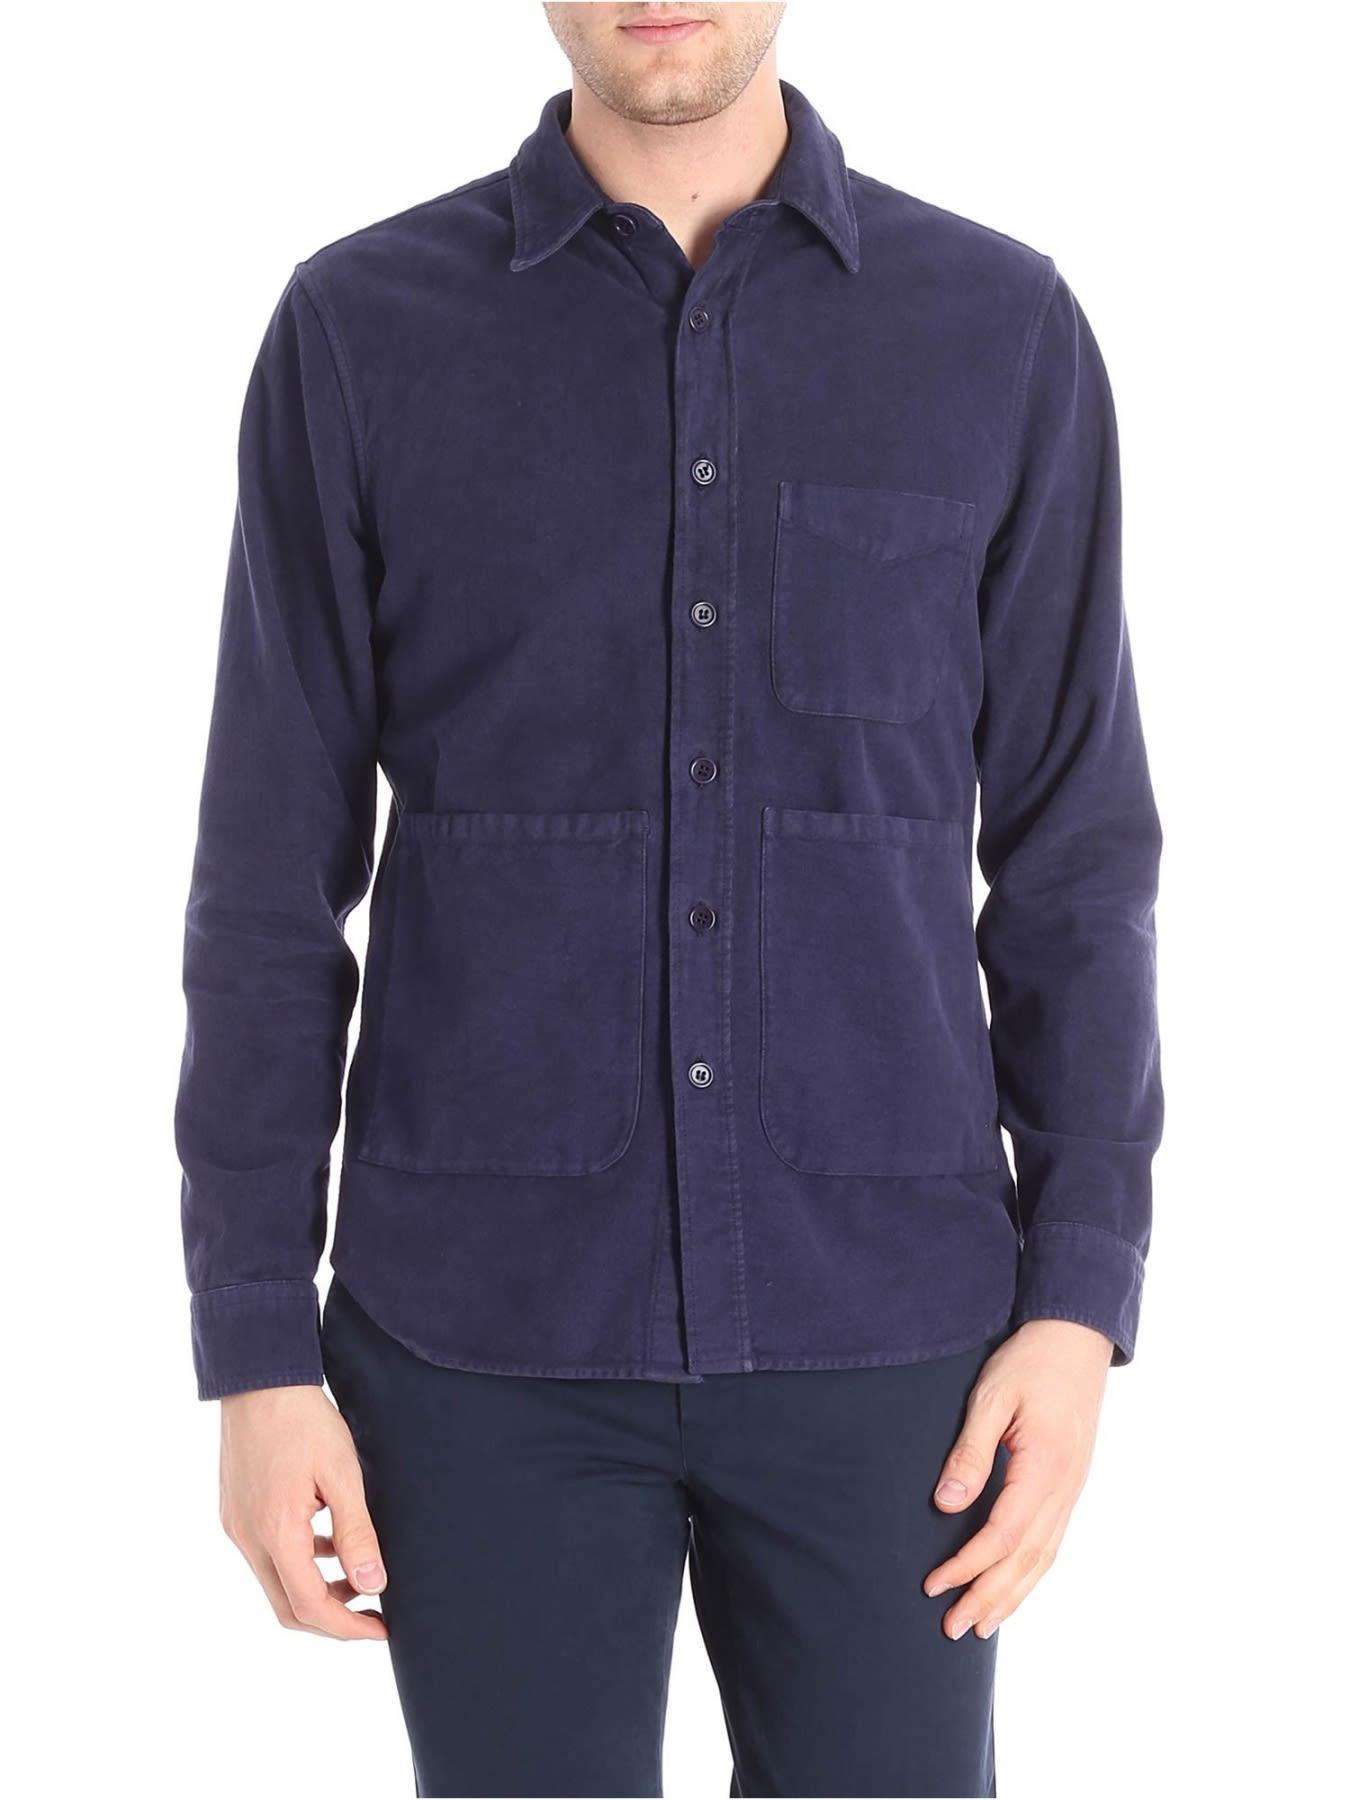 Cotton Shirt Jacket